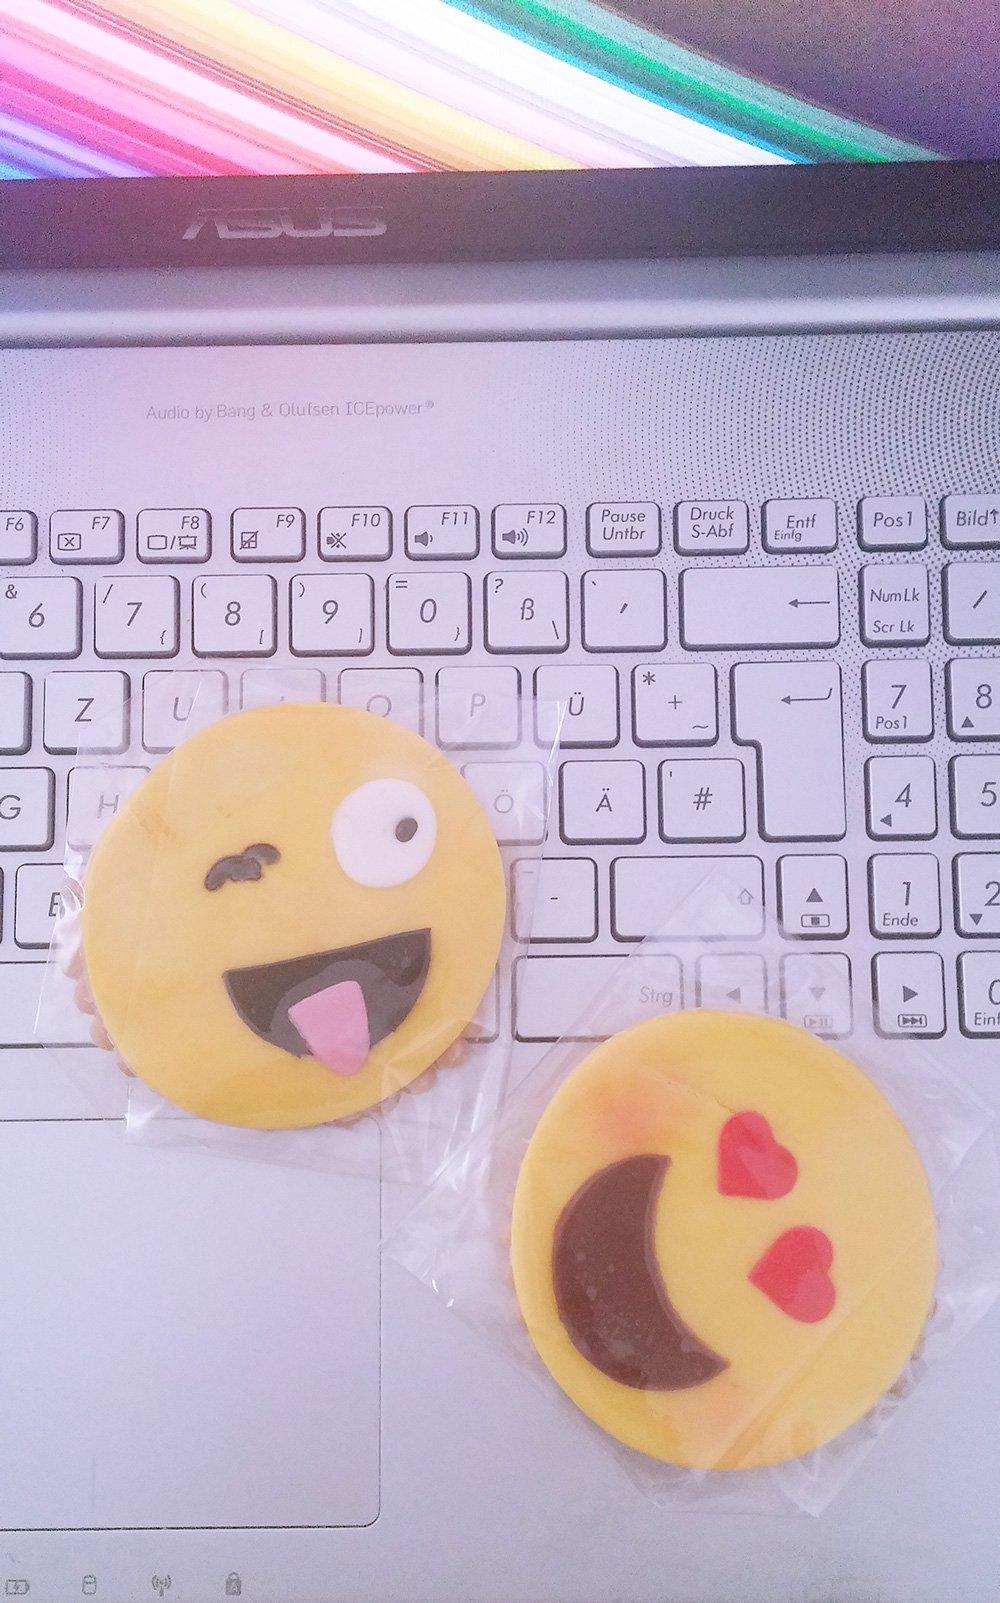 Emojis, Kekse, YUPIK Infodays, München